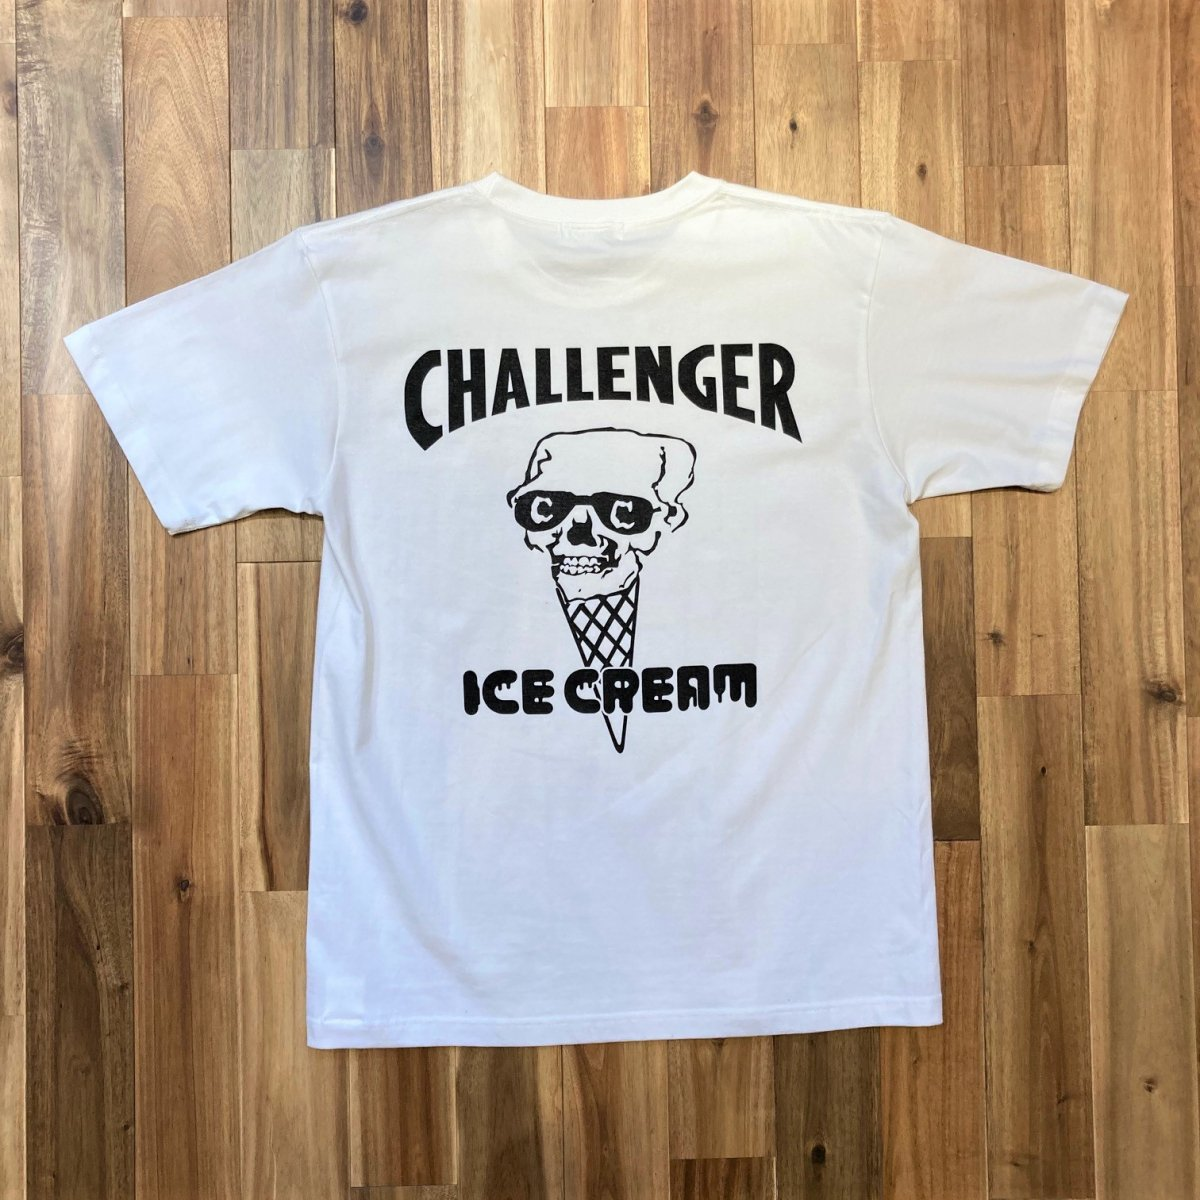 <img class='new_mark_img1' src='https://img.shop-pro.jp/img/new/icons3.gif' style='border:none;display:inline;margin:0px;padding:0px;width:auto;' />ICE CREAM アイスクリーム / Tシャツ × CHALLENGER SKULL T-SHIRT 【WHITE】